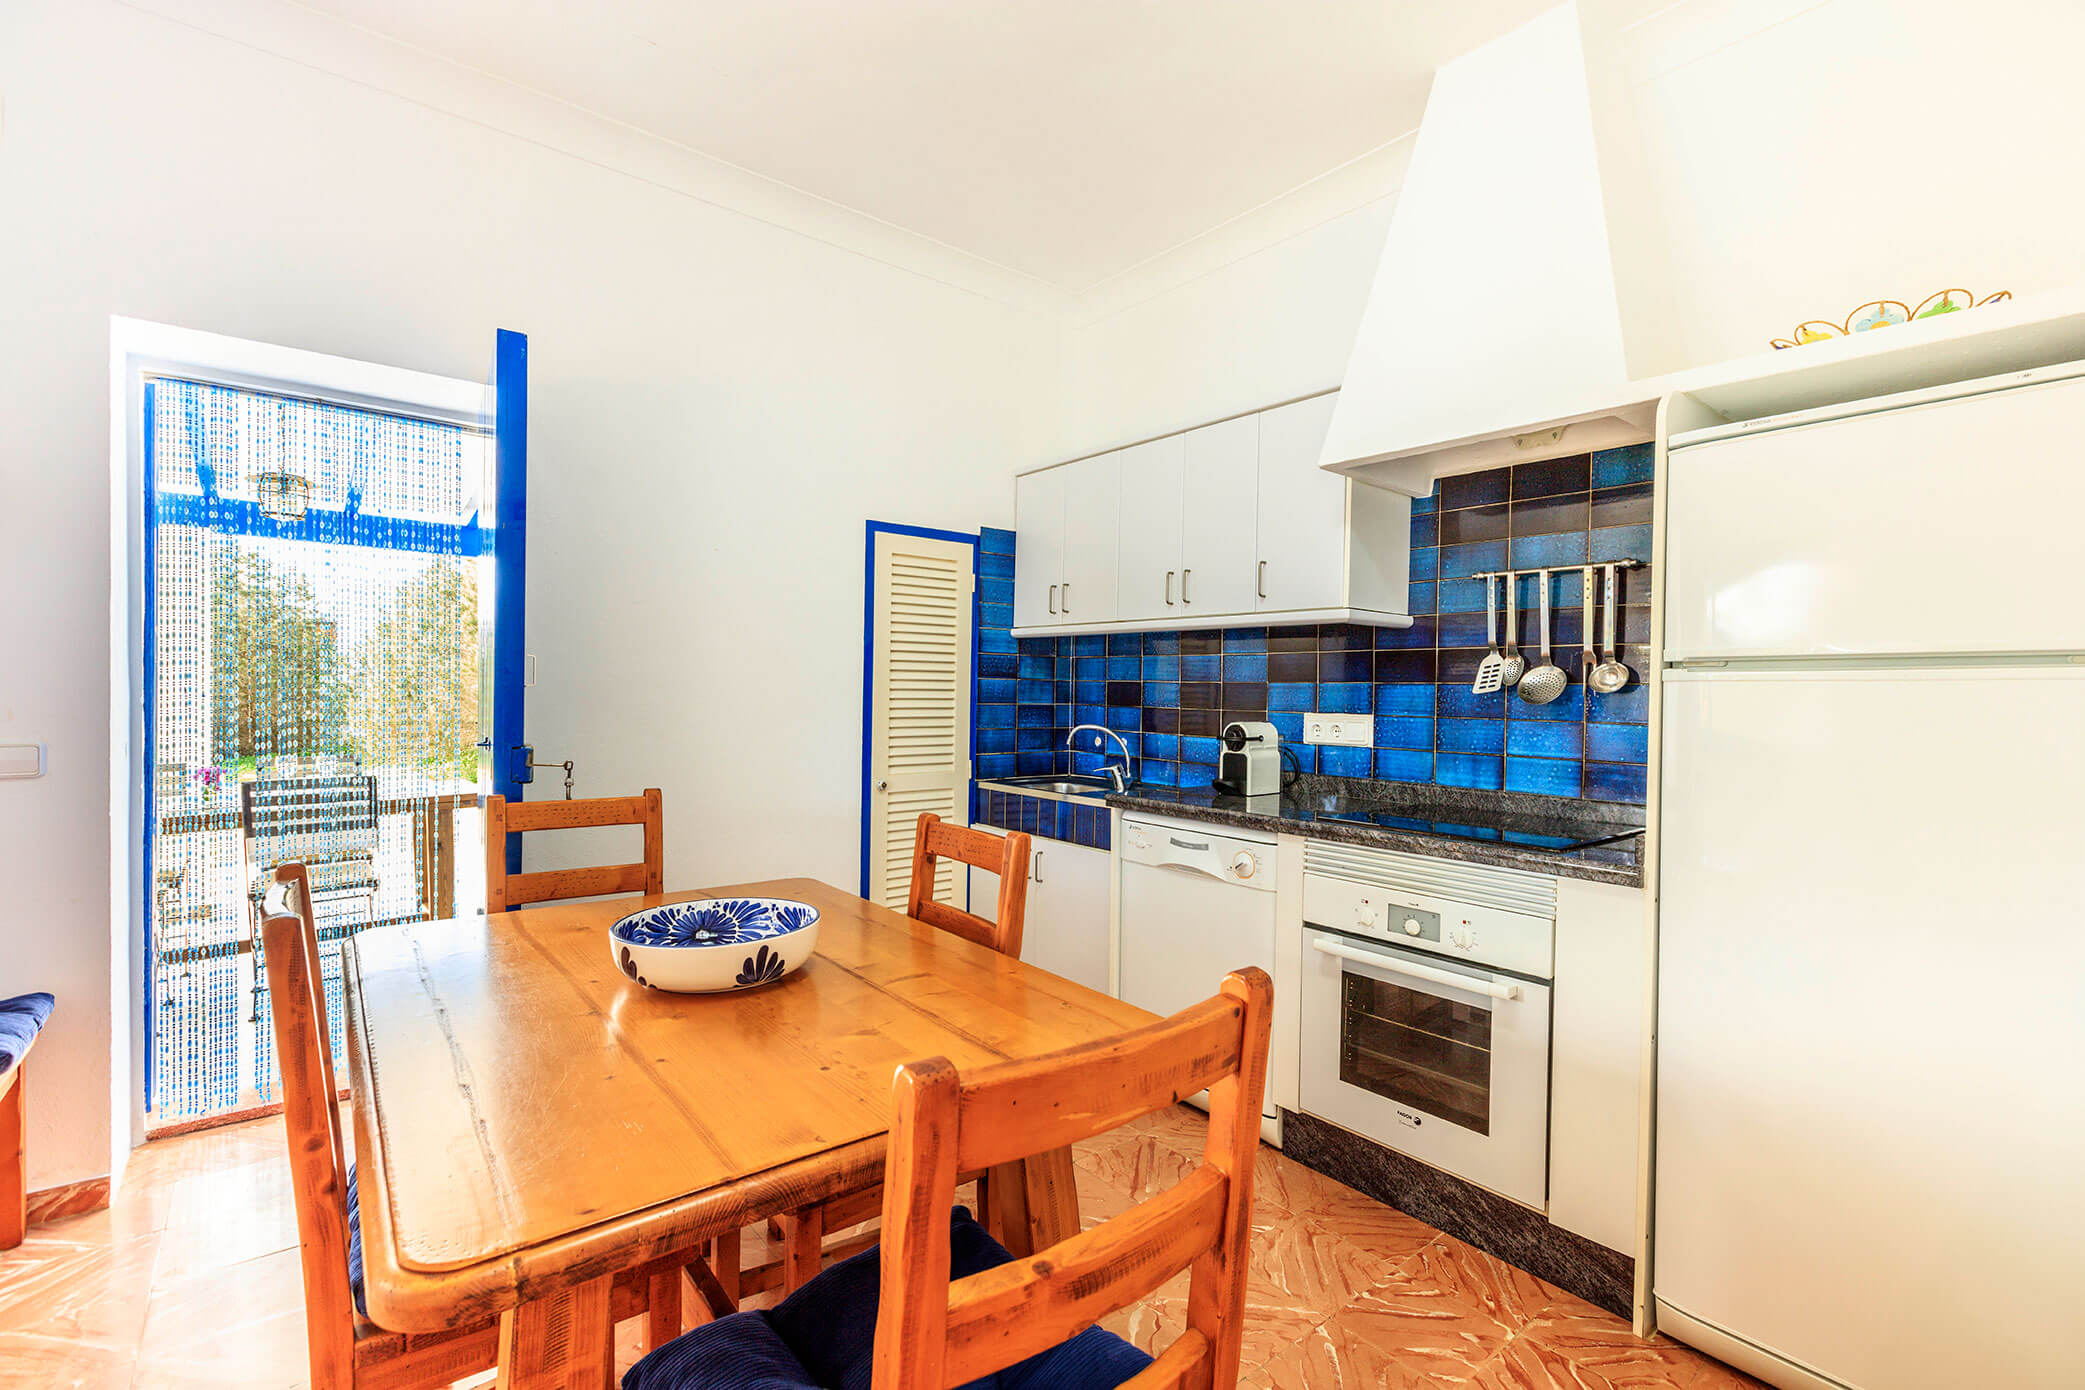 Casa rural Can Carlets. Cocina amplia equipada. Alojamientos turísticos Cardona en Formentera.